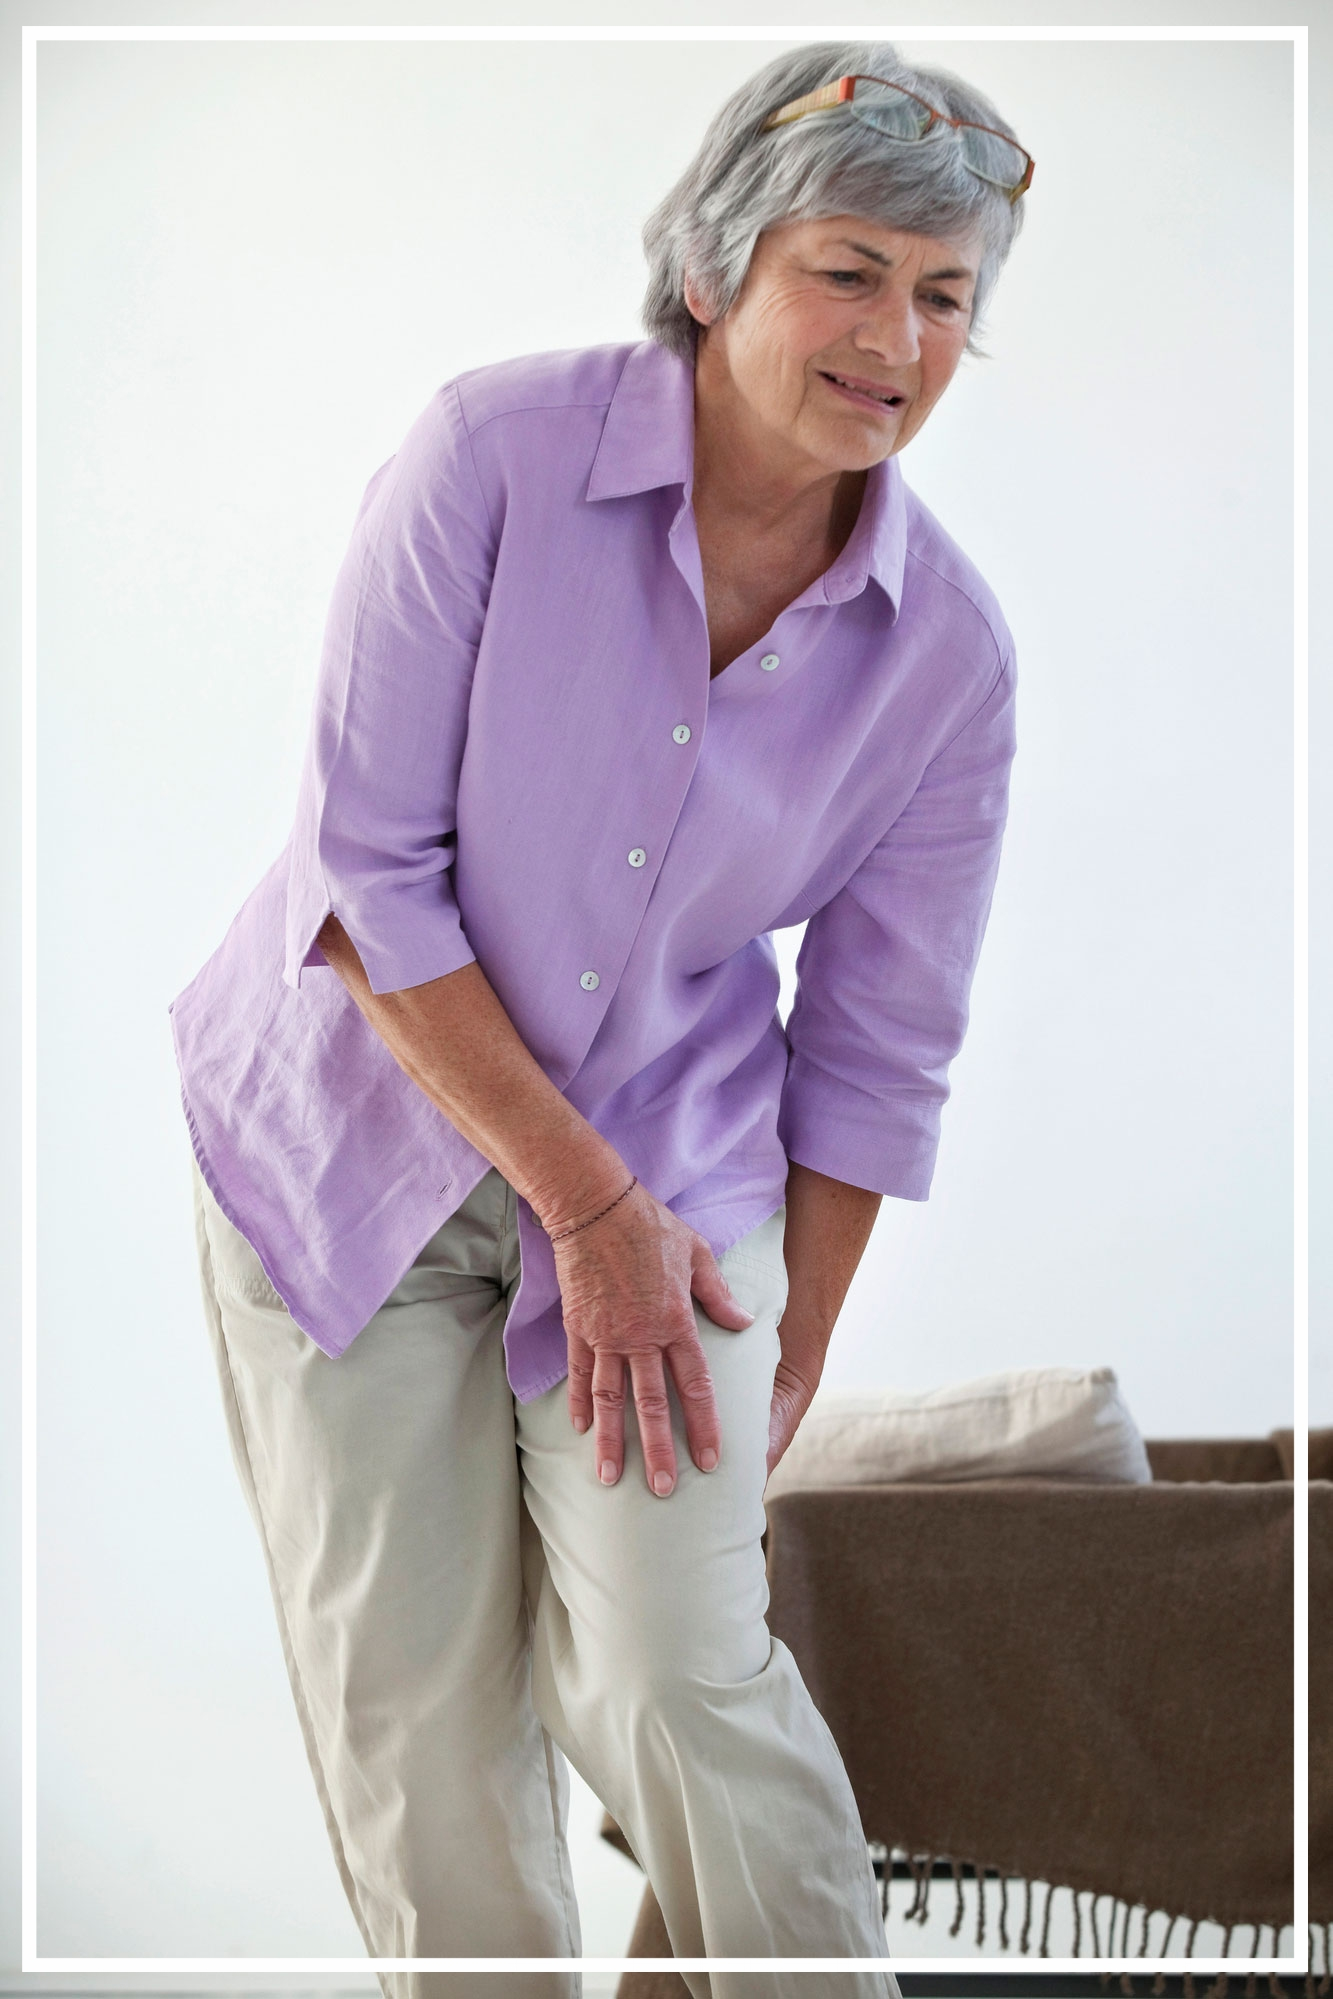 spinal-stenosis-symptoms.jpg